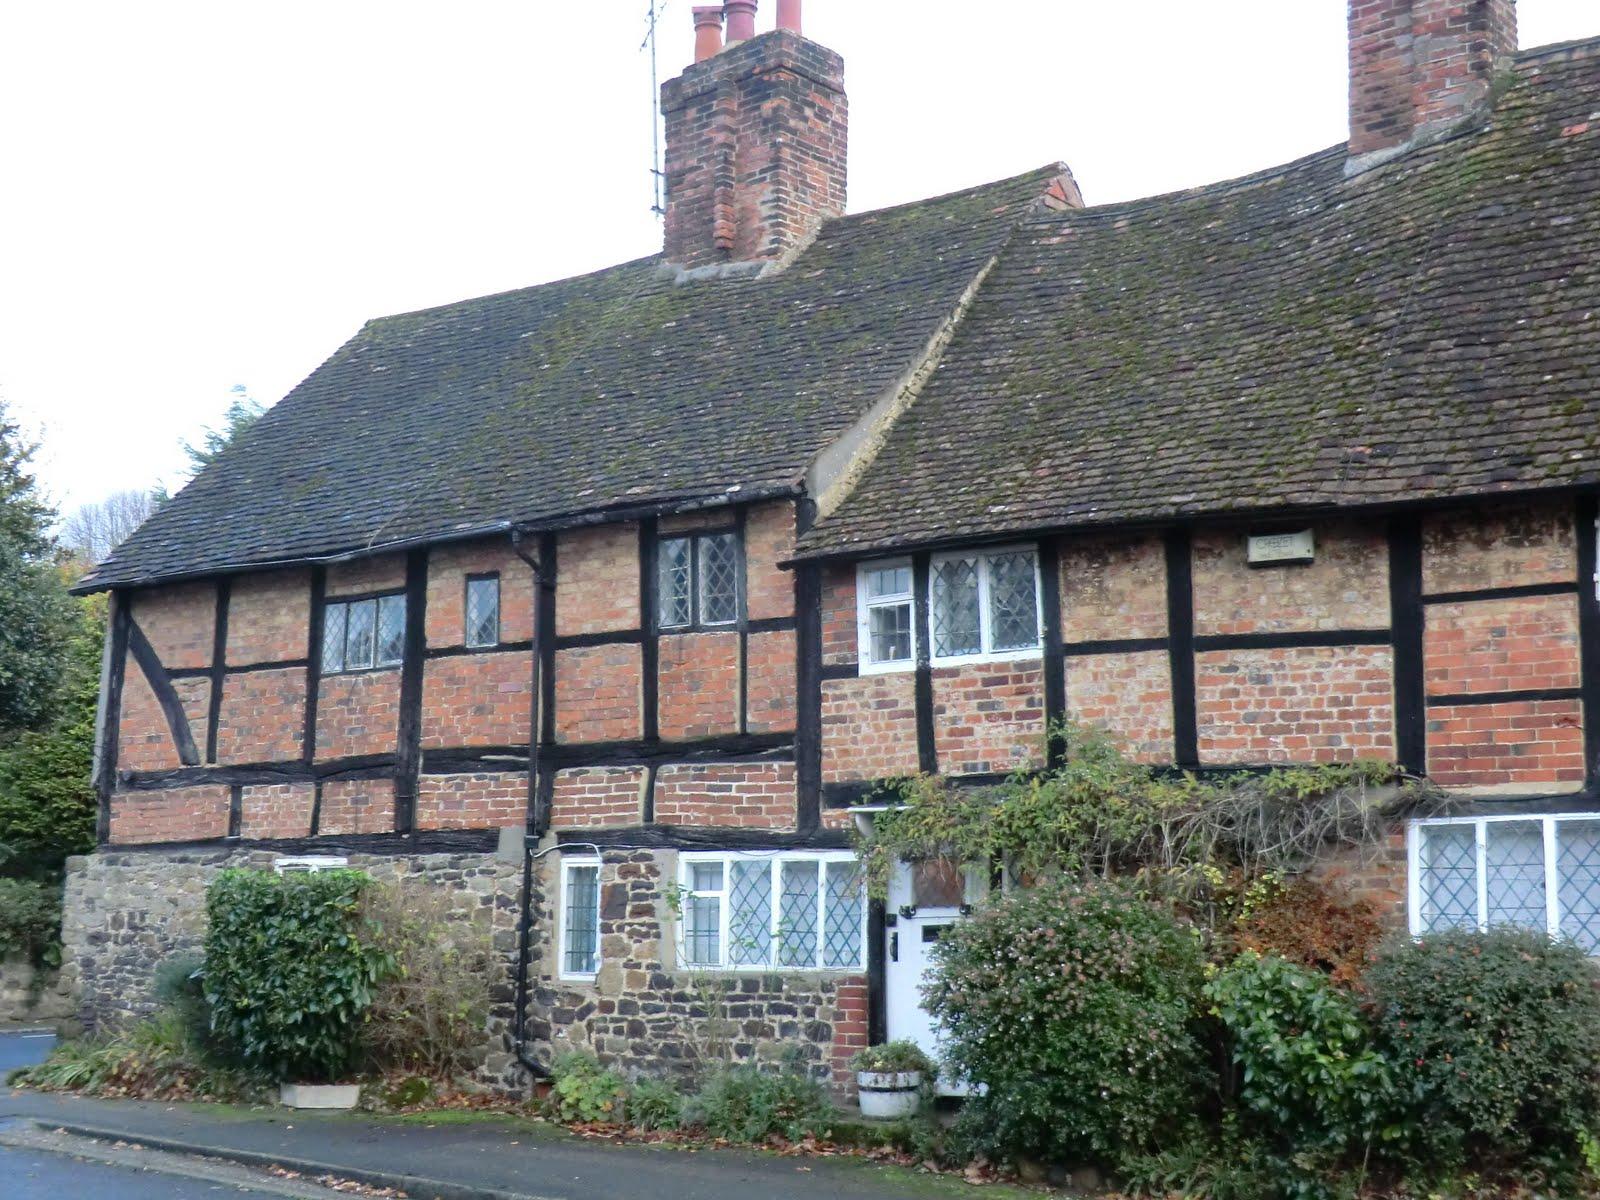 CIMG0828 Detillens Cottages, Limpsfield